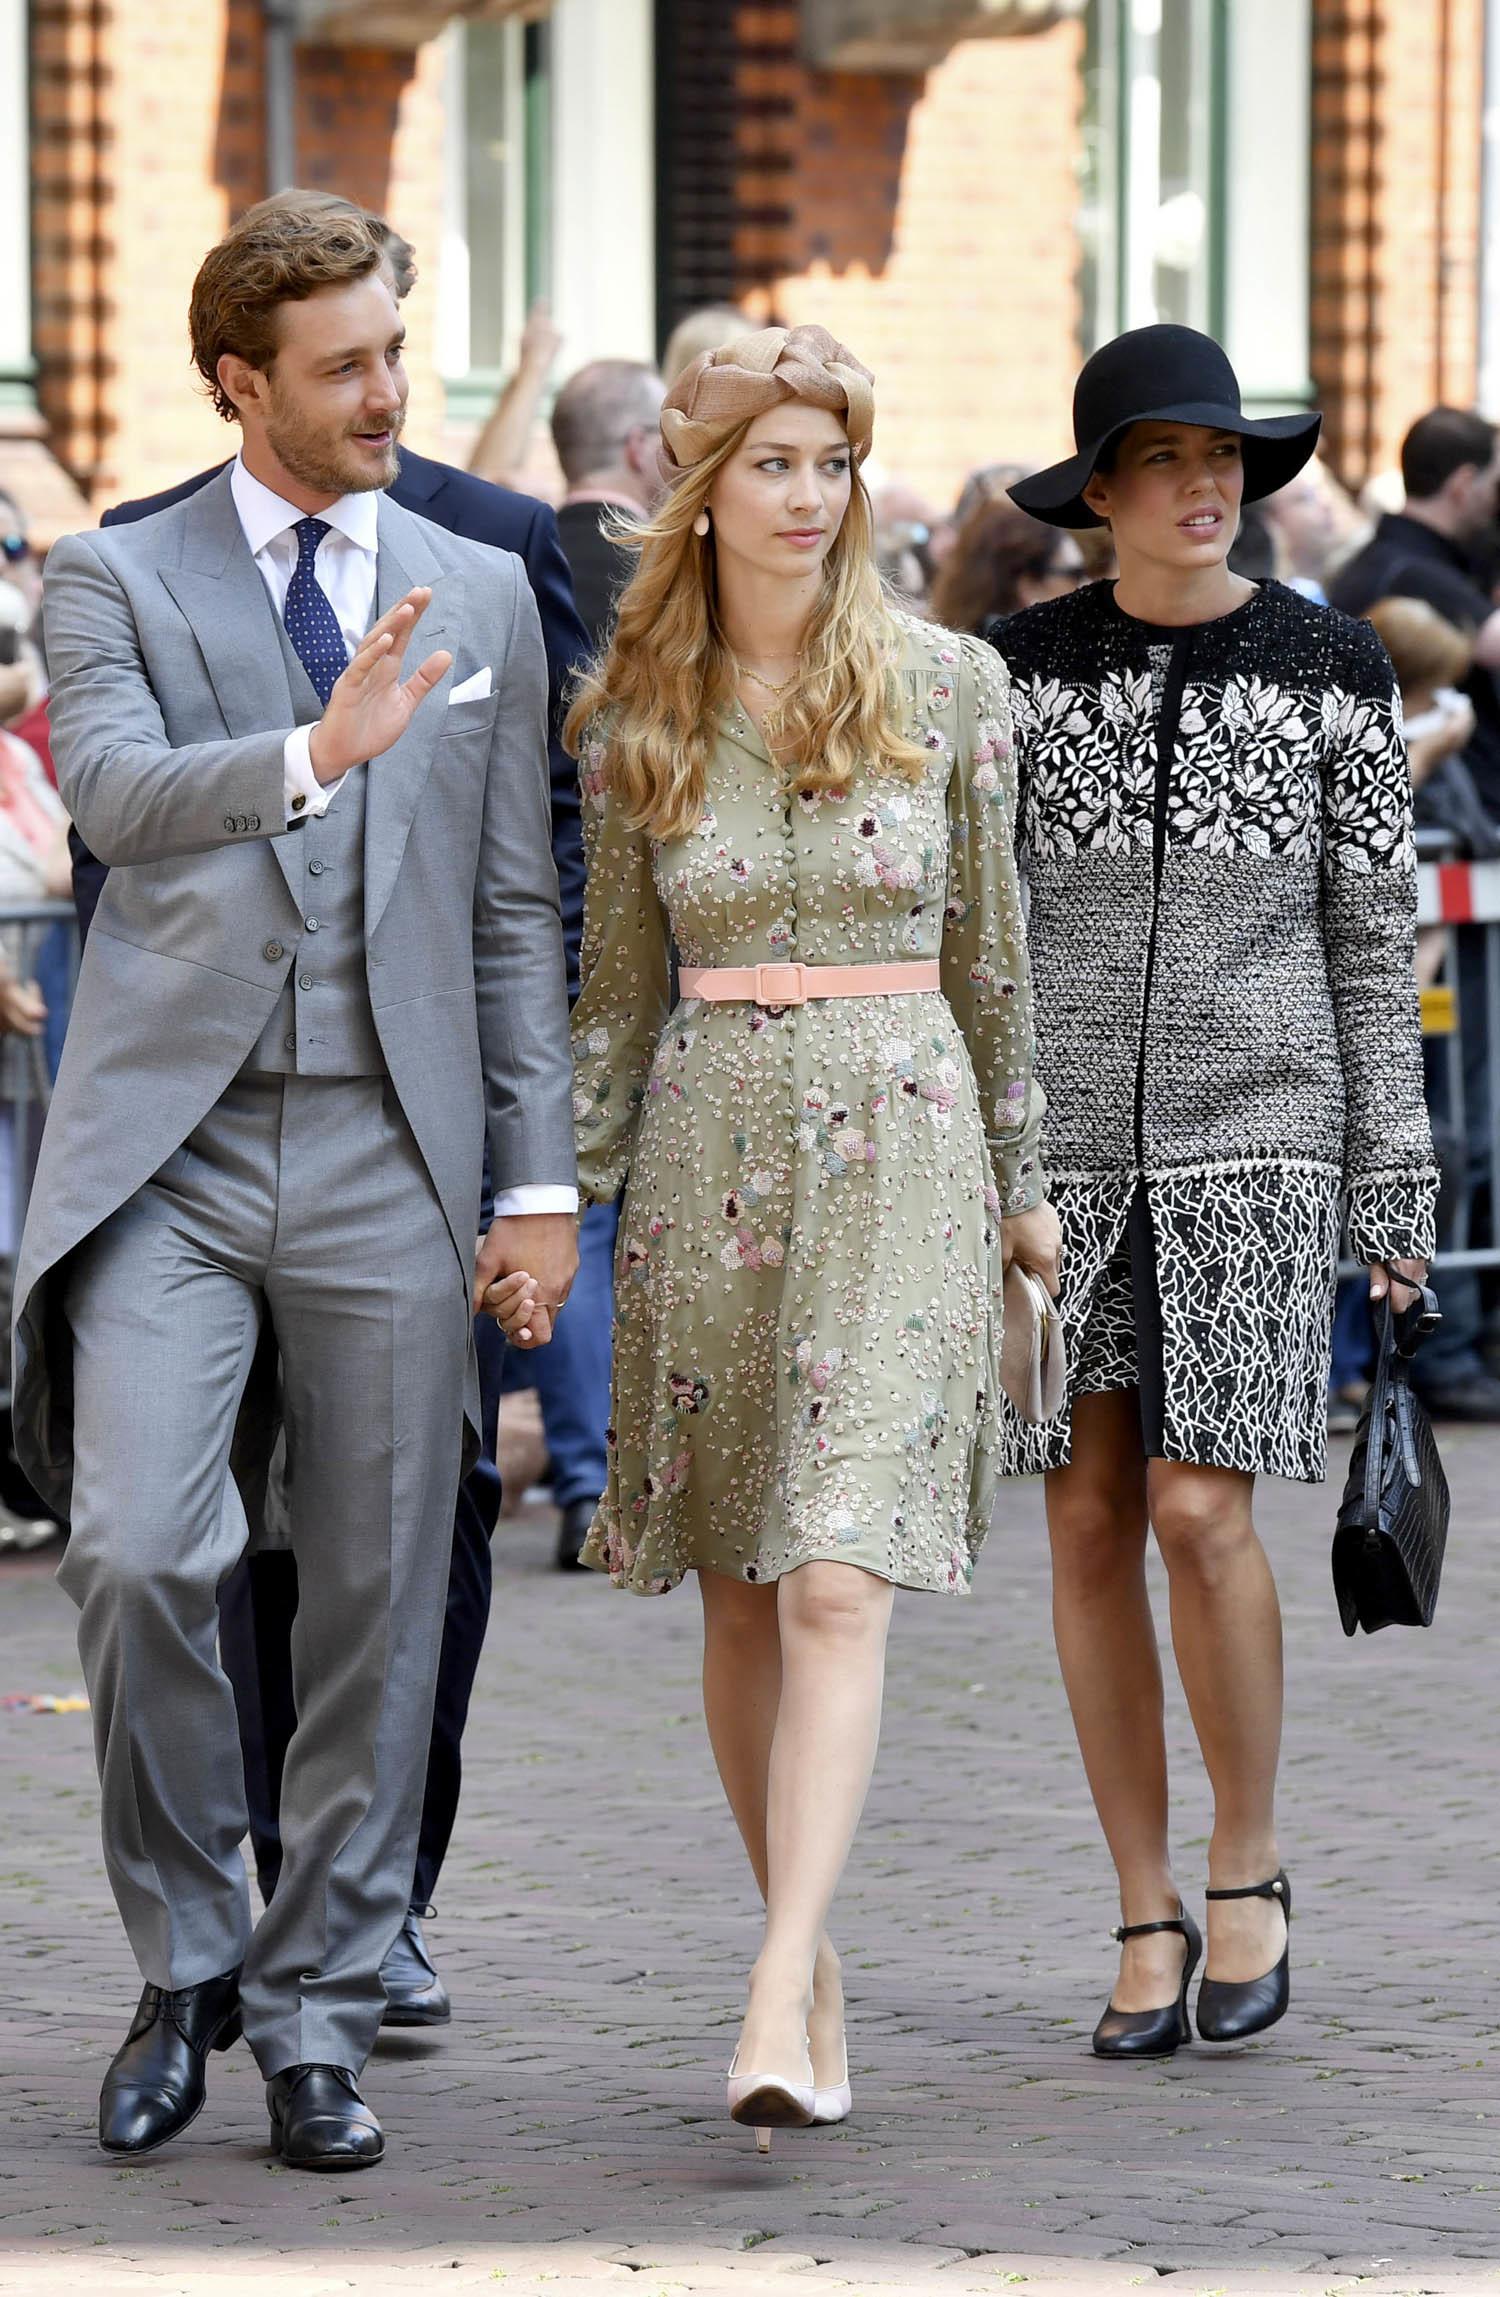 Pierre Casiraghi junto a su mujer Beatriz Borromeo. Detras Carlota...